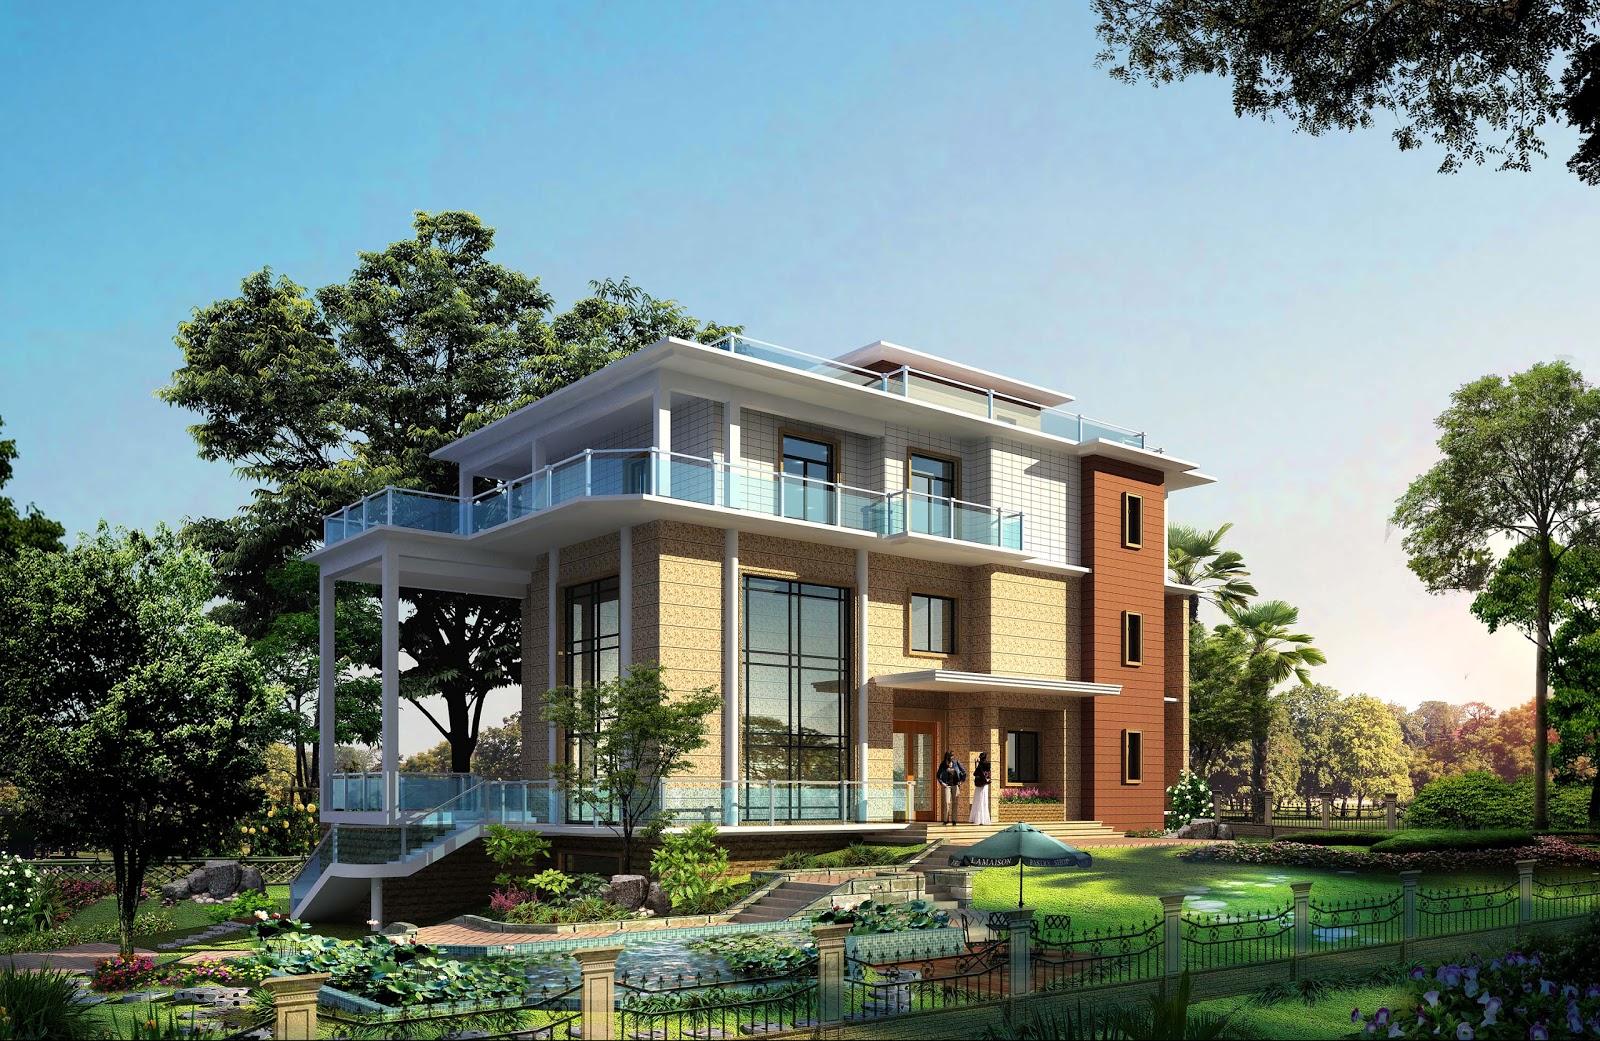 Chief Architect Software Architecture Villa Image Architecture Rendering